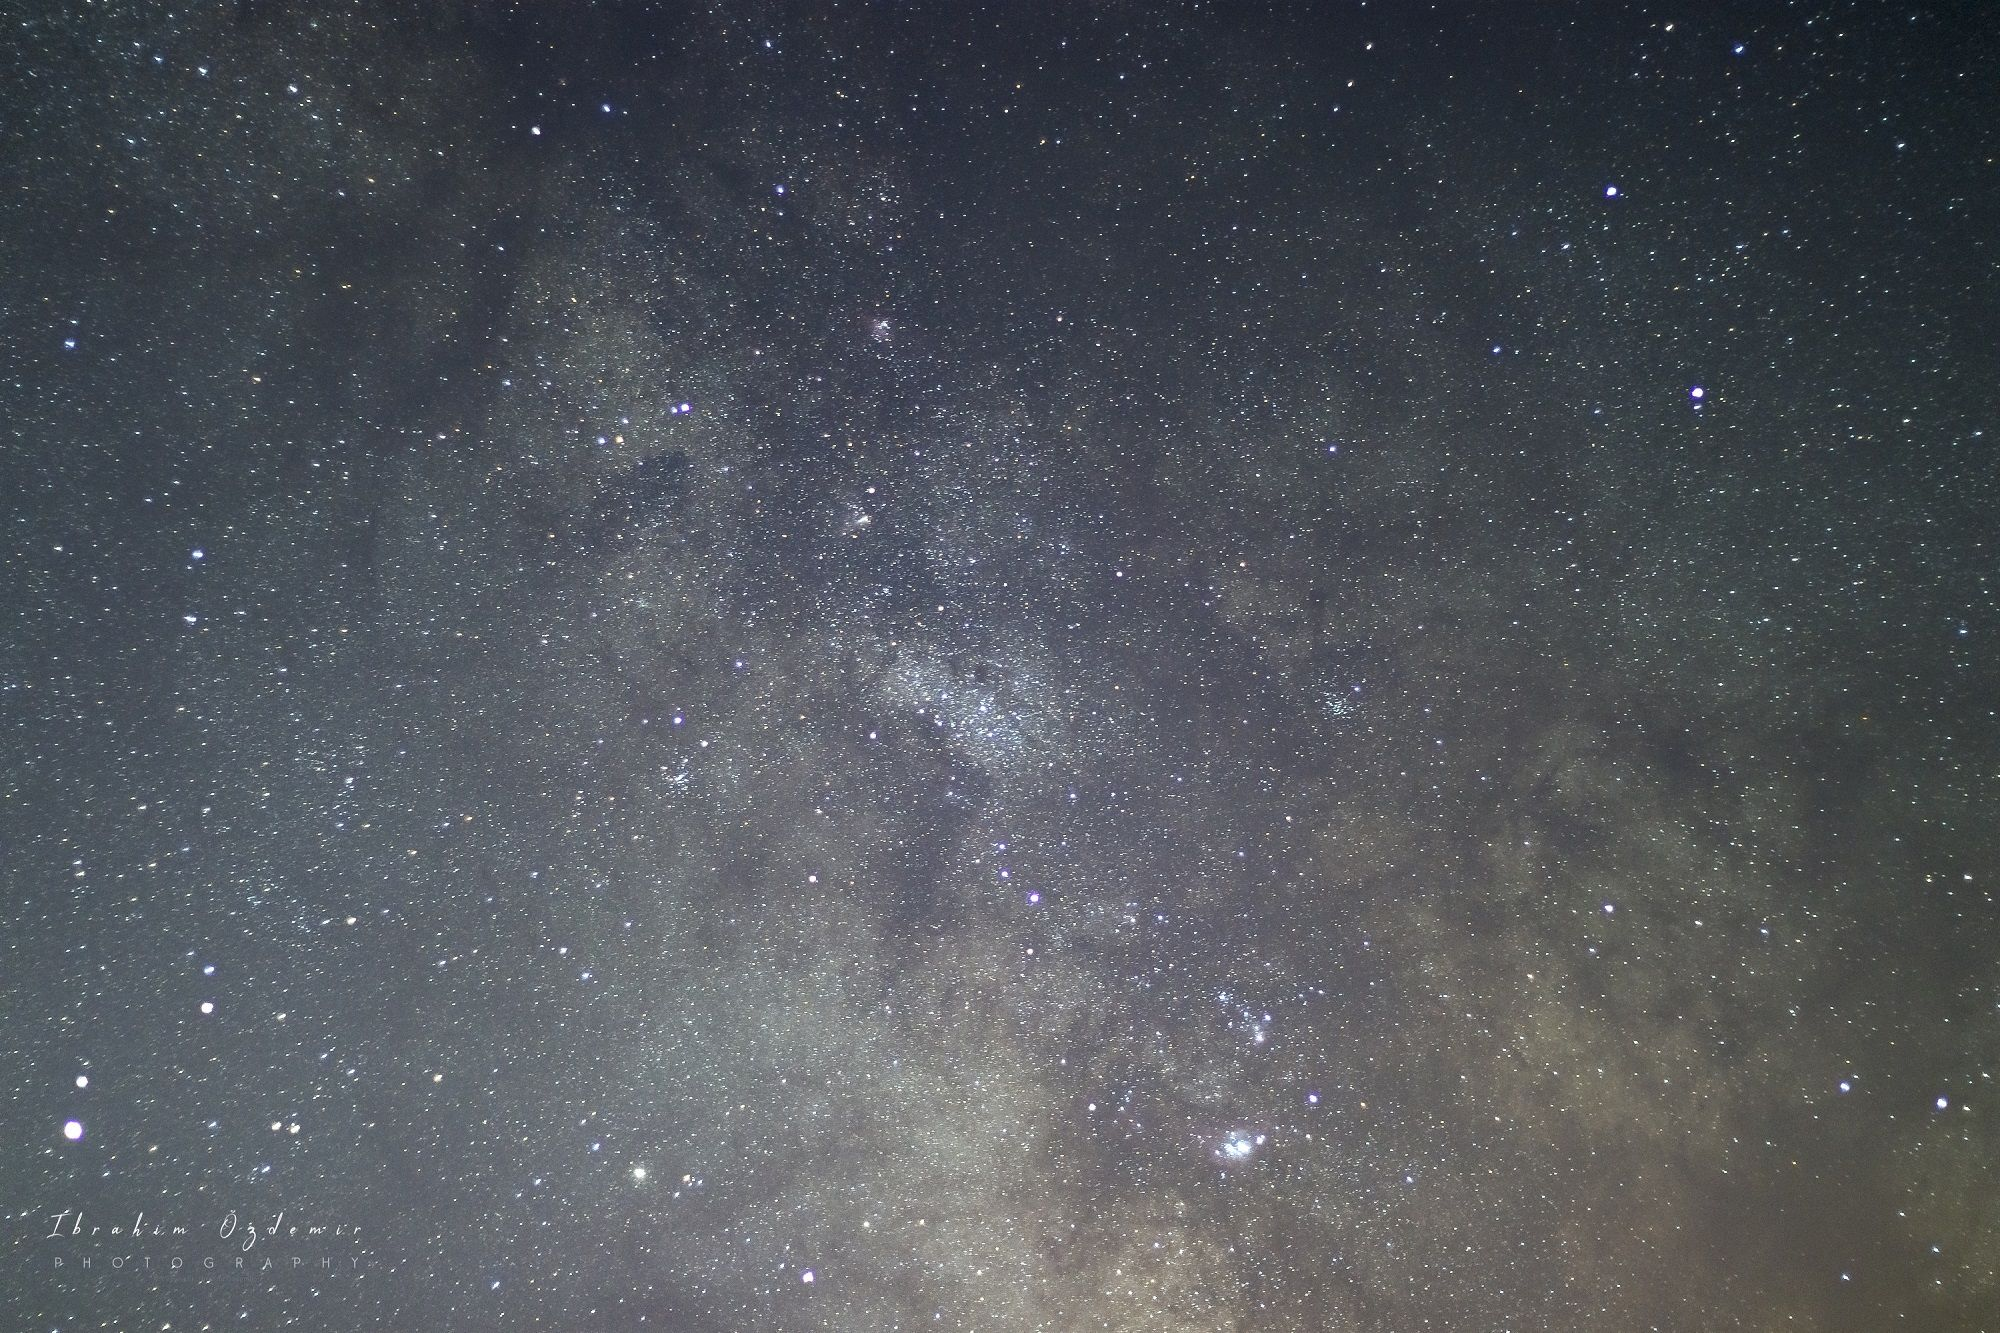 galaxy-stacked-jpg.550017